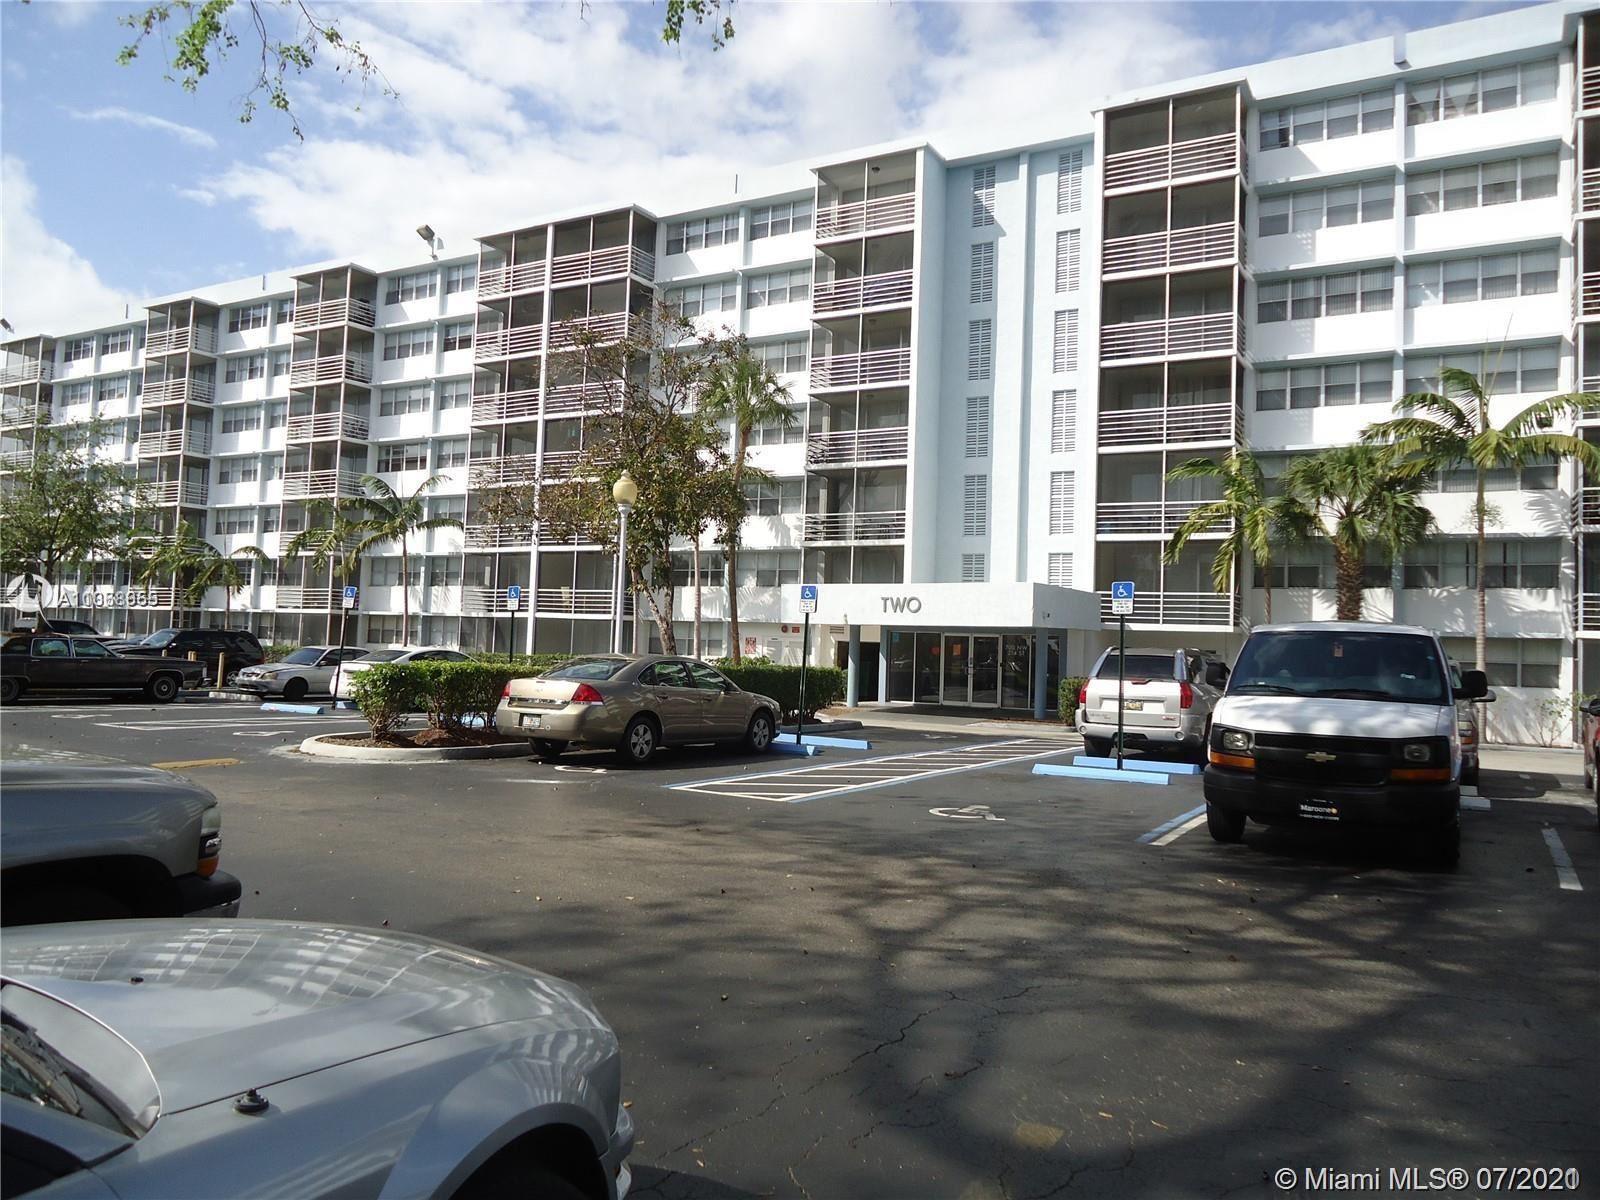 700 NW 214th St #406, Miami Gardens, FL 33169 - #: A11068655